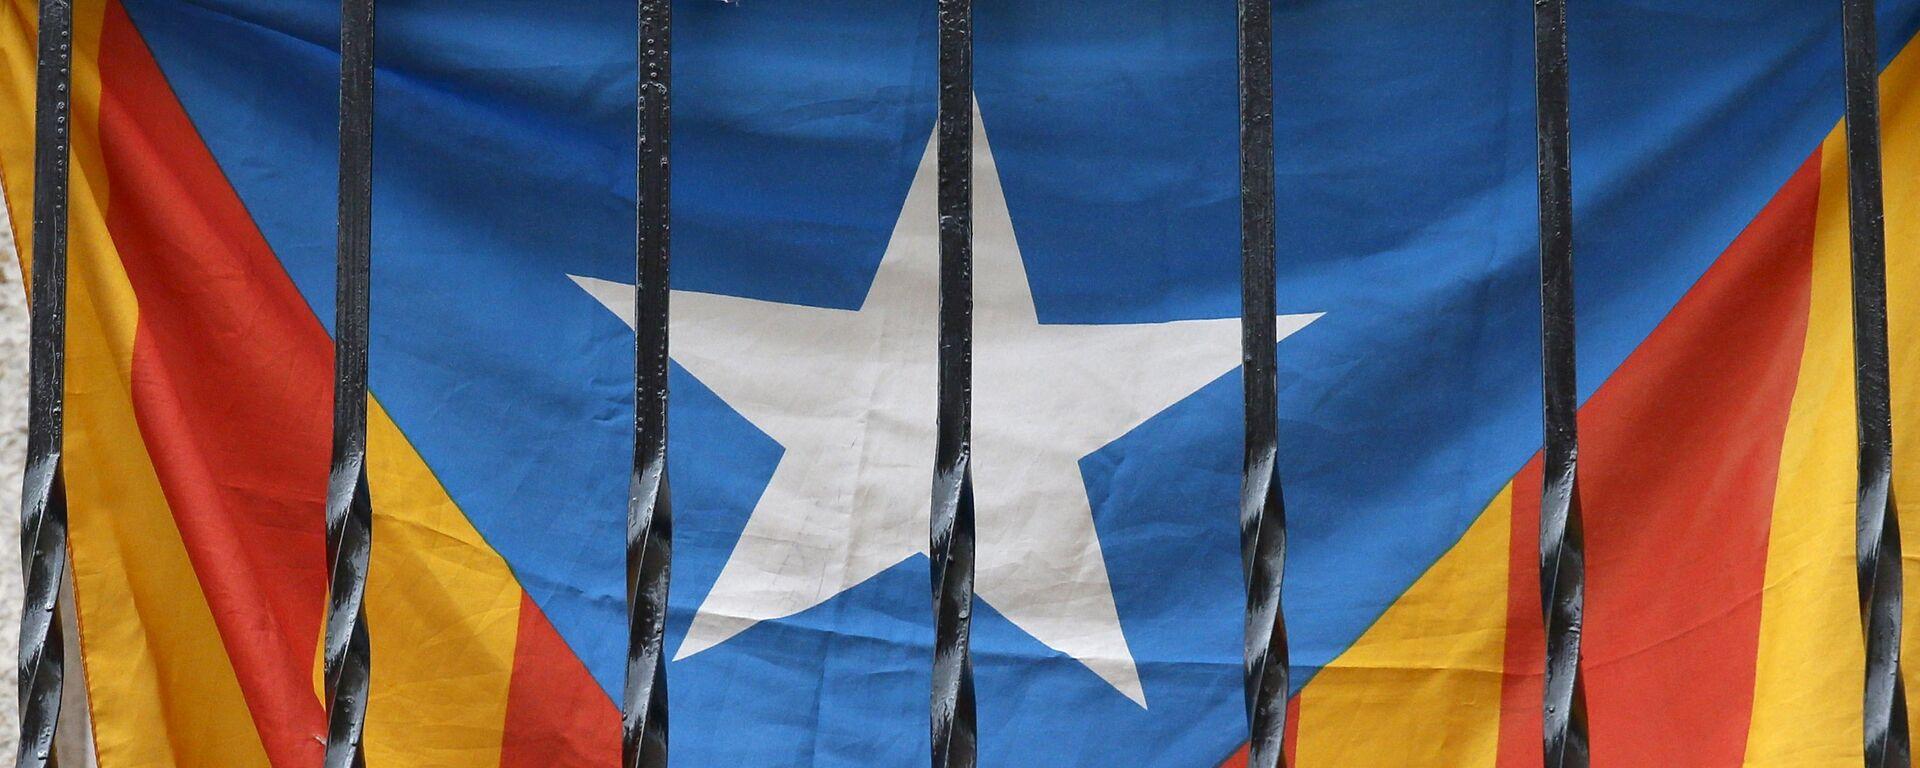 'Estelada', bandera de Cataluña en un balcón en Barcelona - Sputnik Mundo, 1920, 22.06.2021